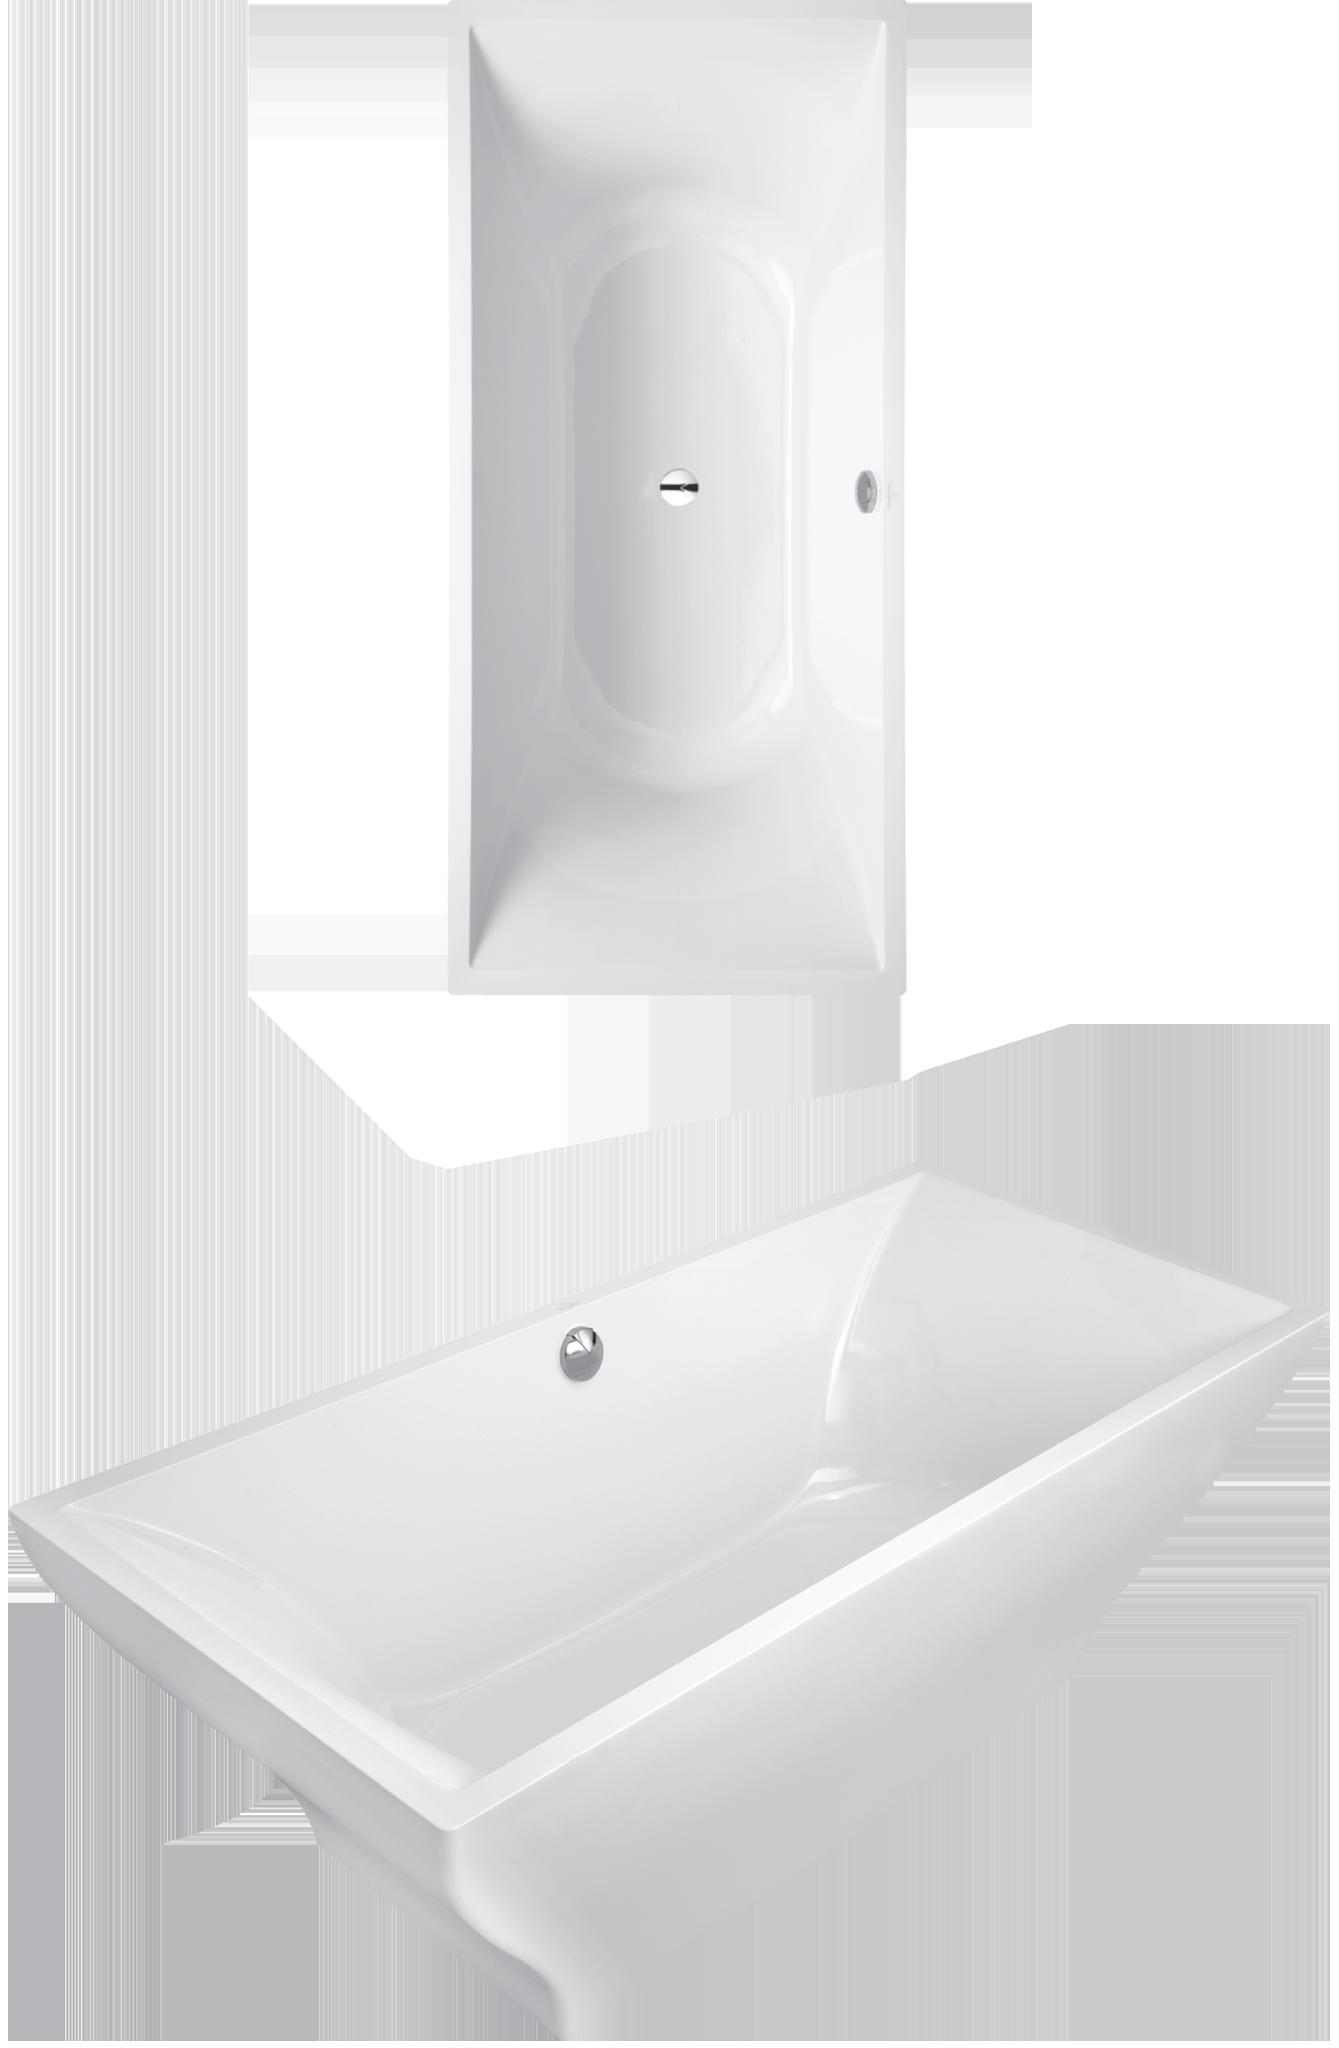 la belle baignoire en il t ubq180lab9w1v villeroy boch. Black Bedroom Furniture Sets. Home Design Ideas